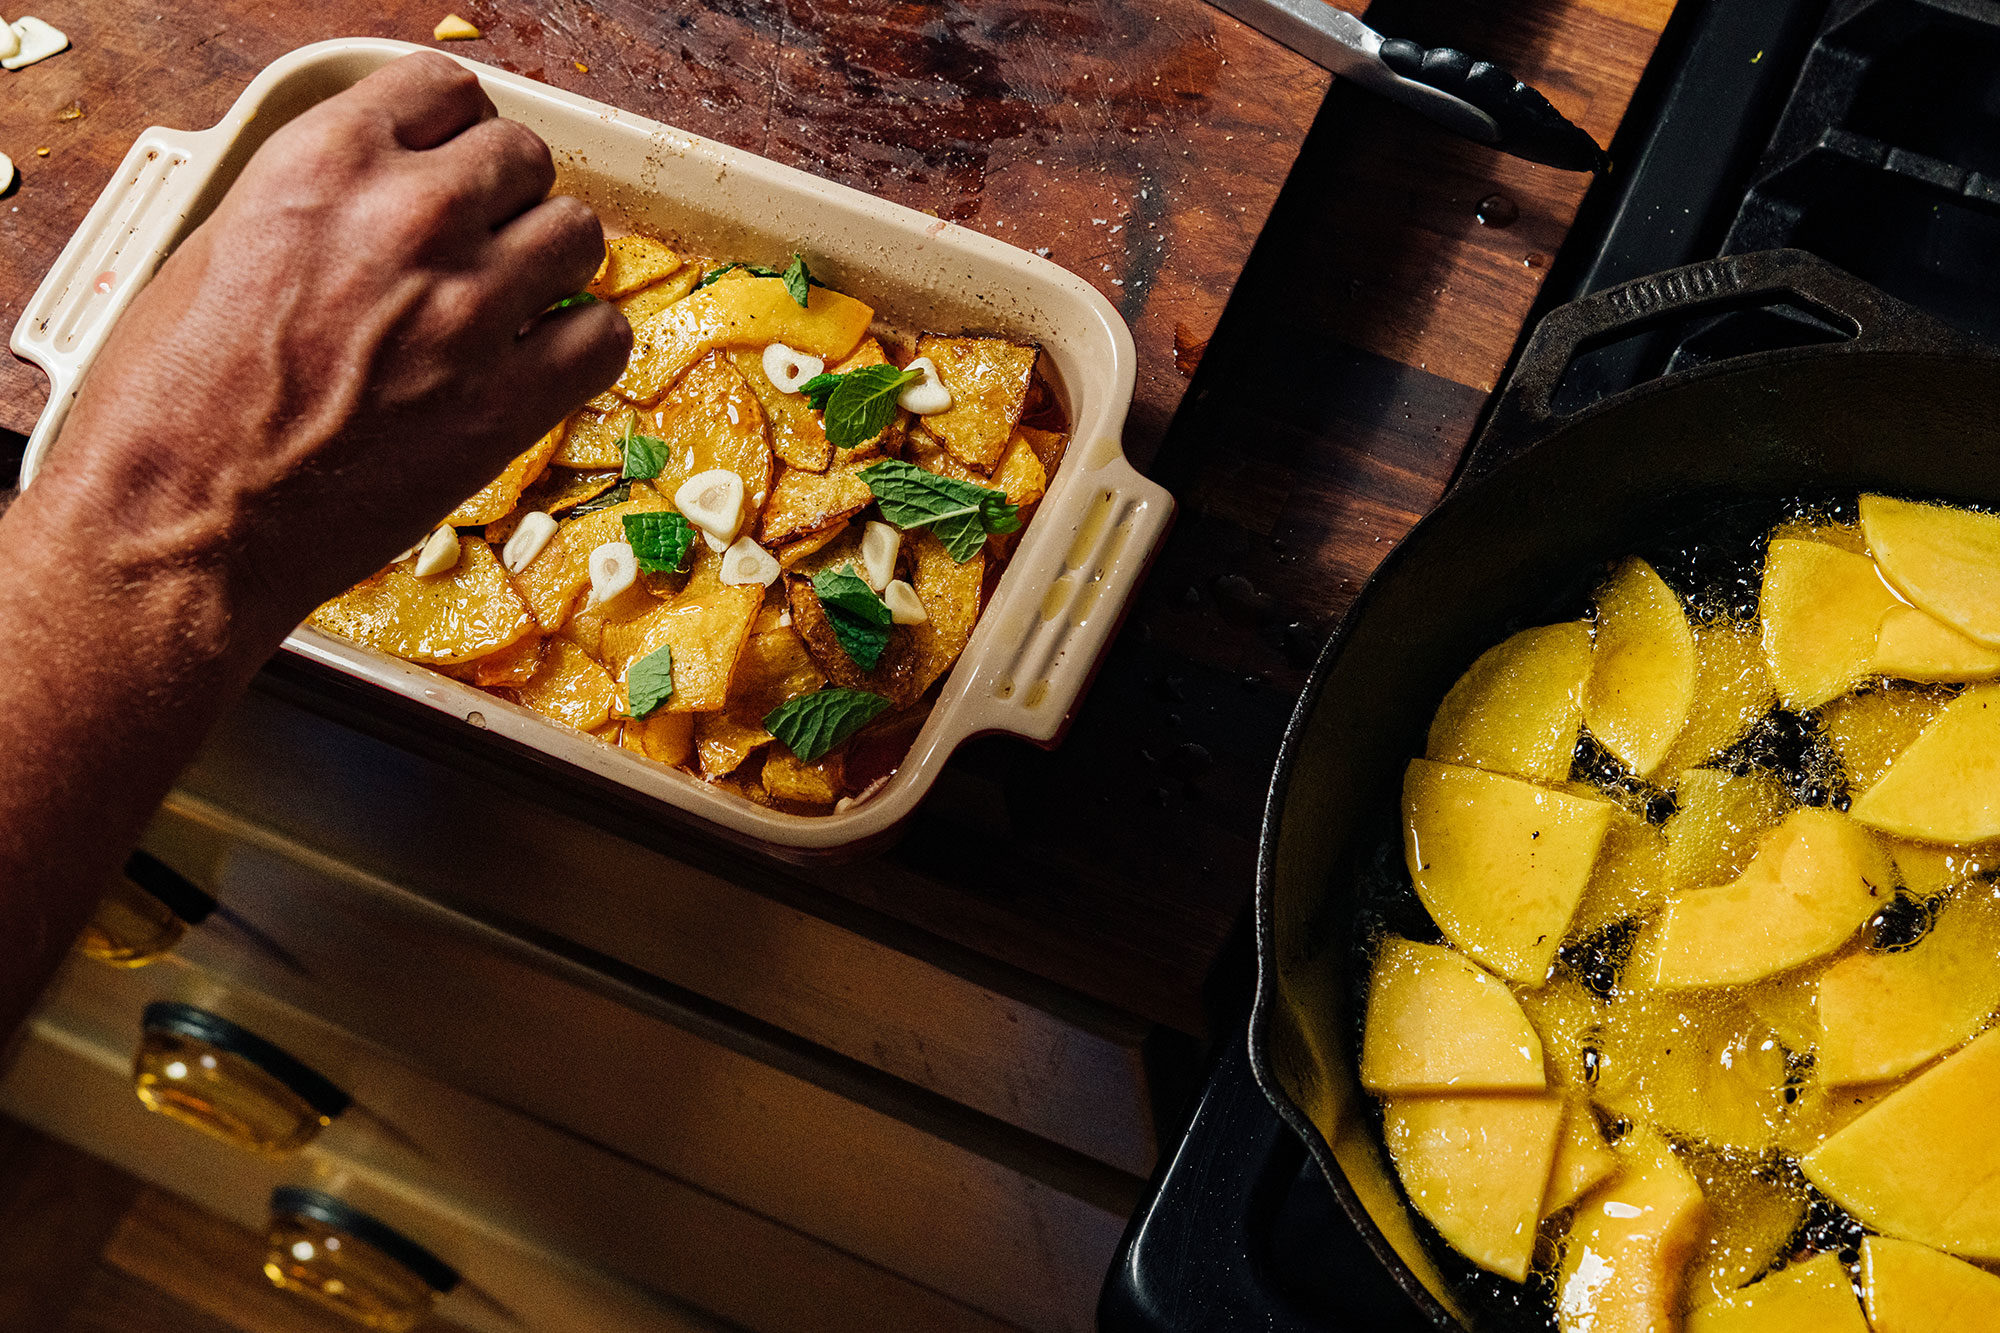 Article-Scott-Hocker-Butternut-Squash-Garlic-Mint-Recipe